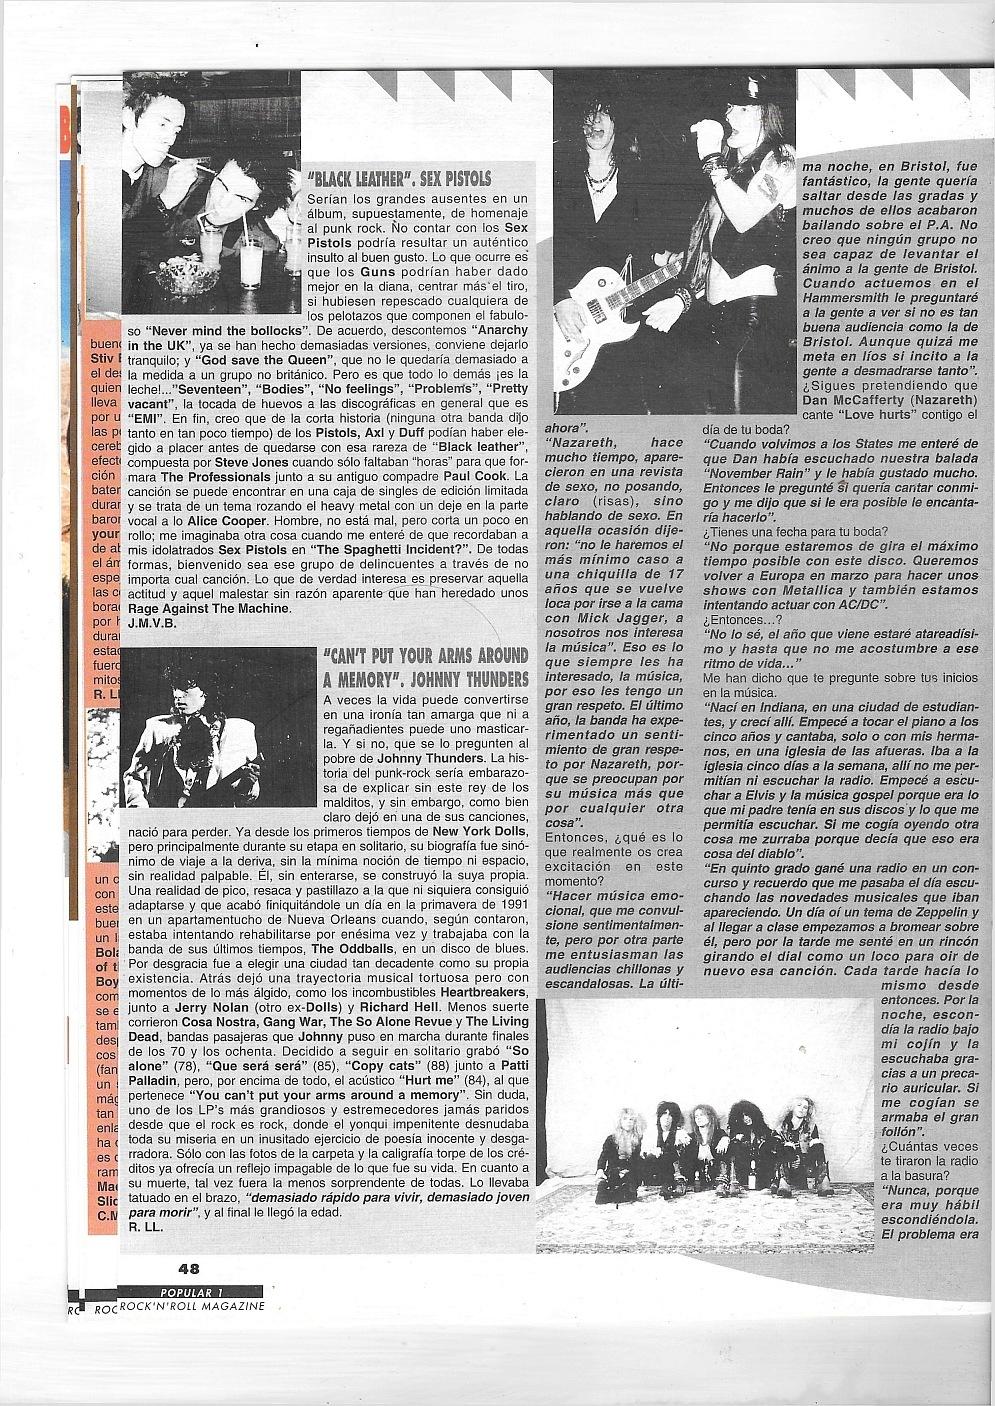 1988.04.DD - Popular 1 - Interview with Axl 1993_130